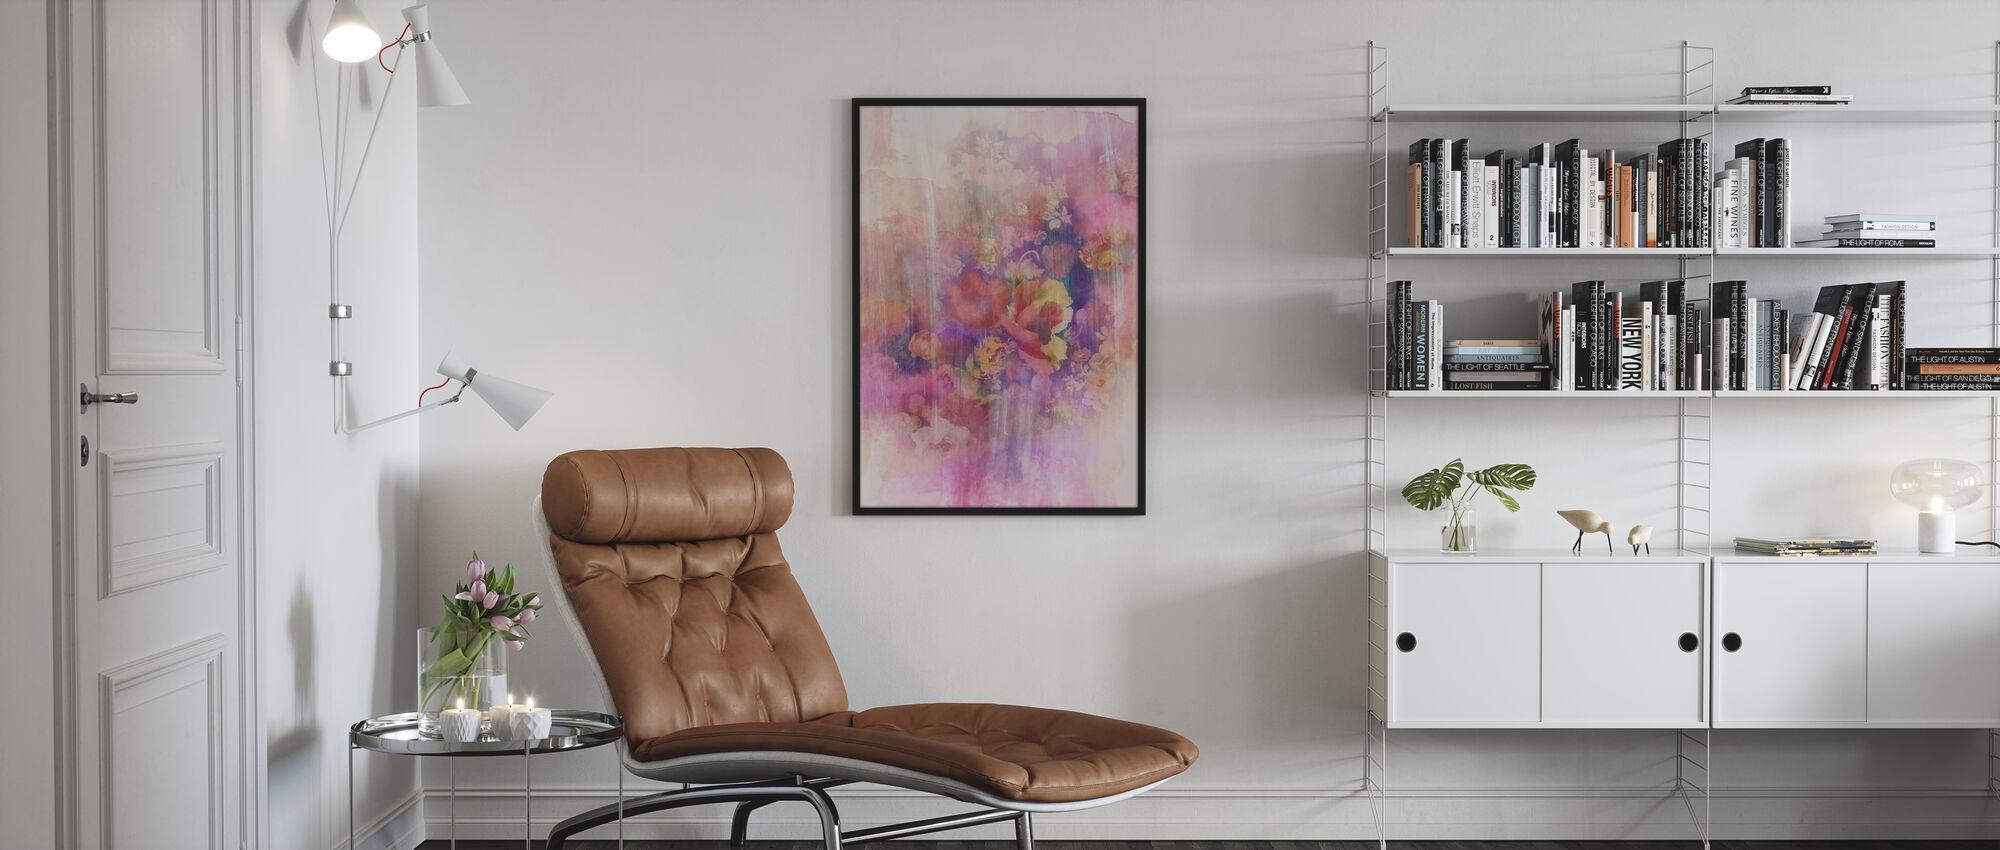 Smokey Blomster april - Plakat - Stue